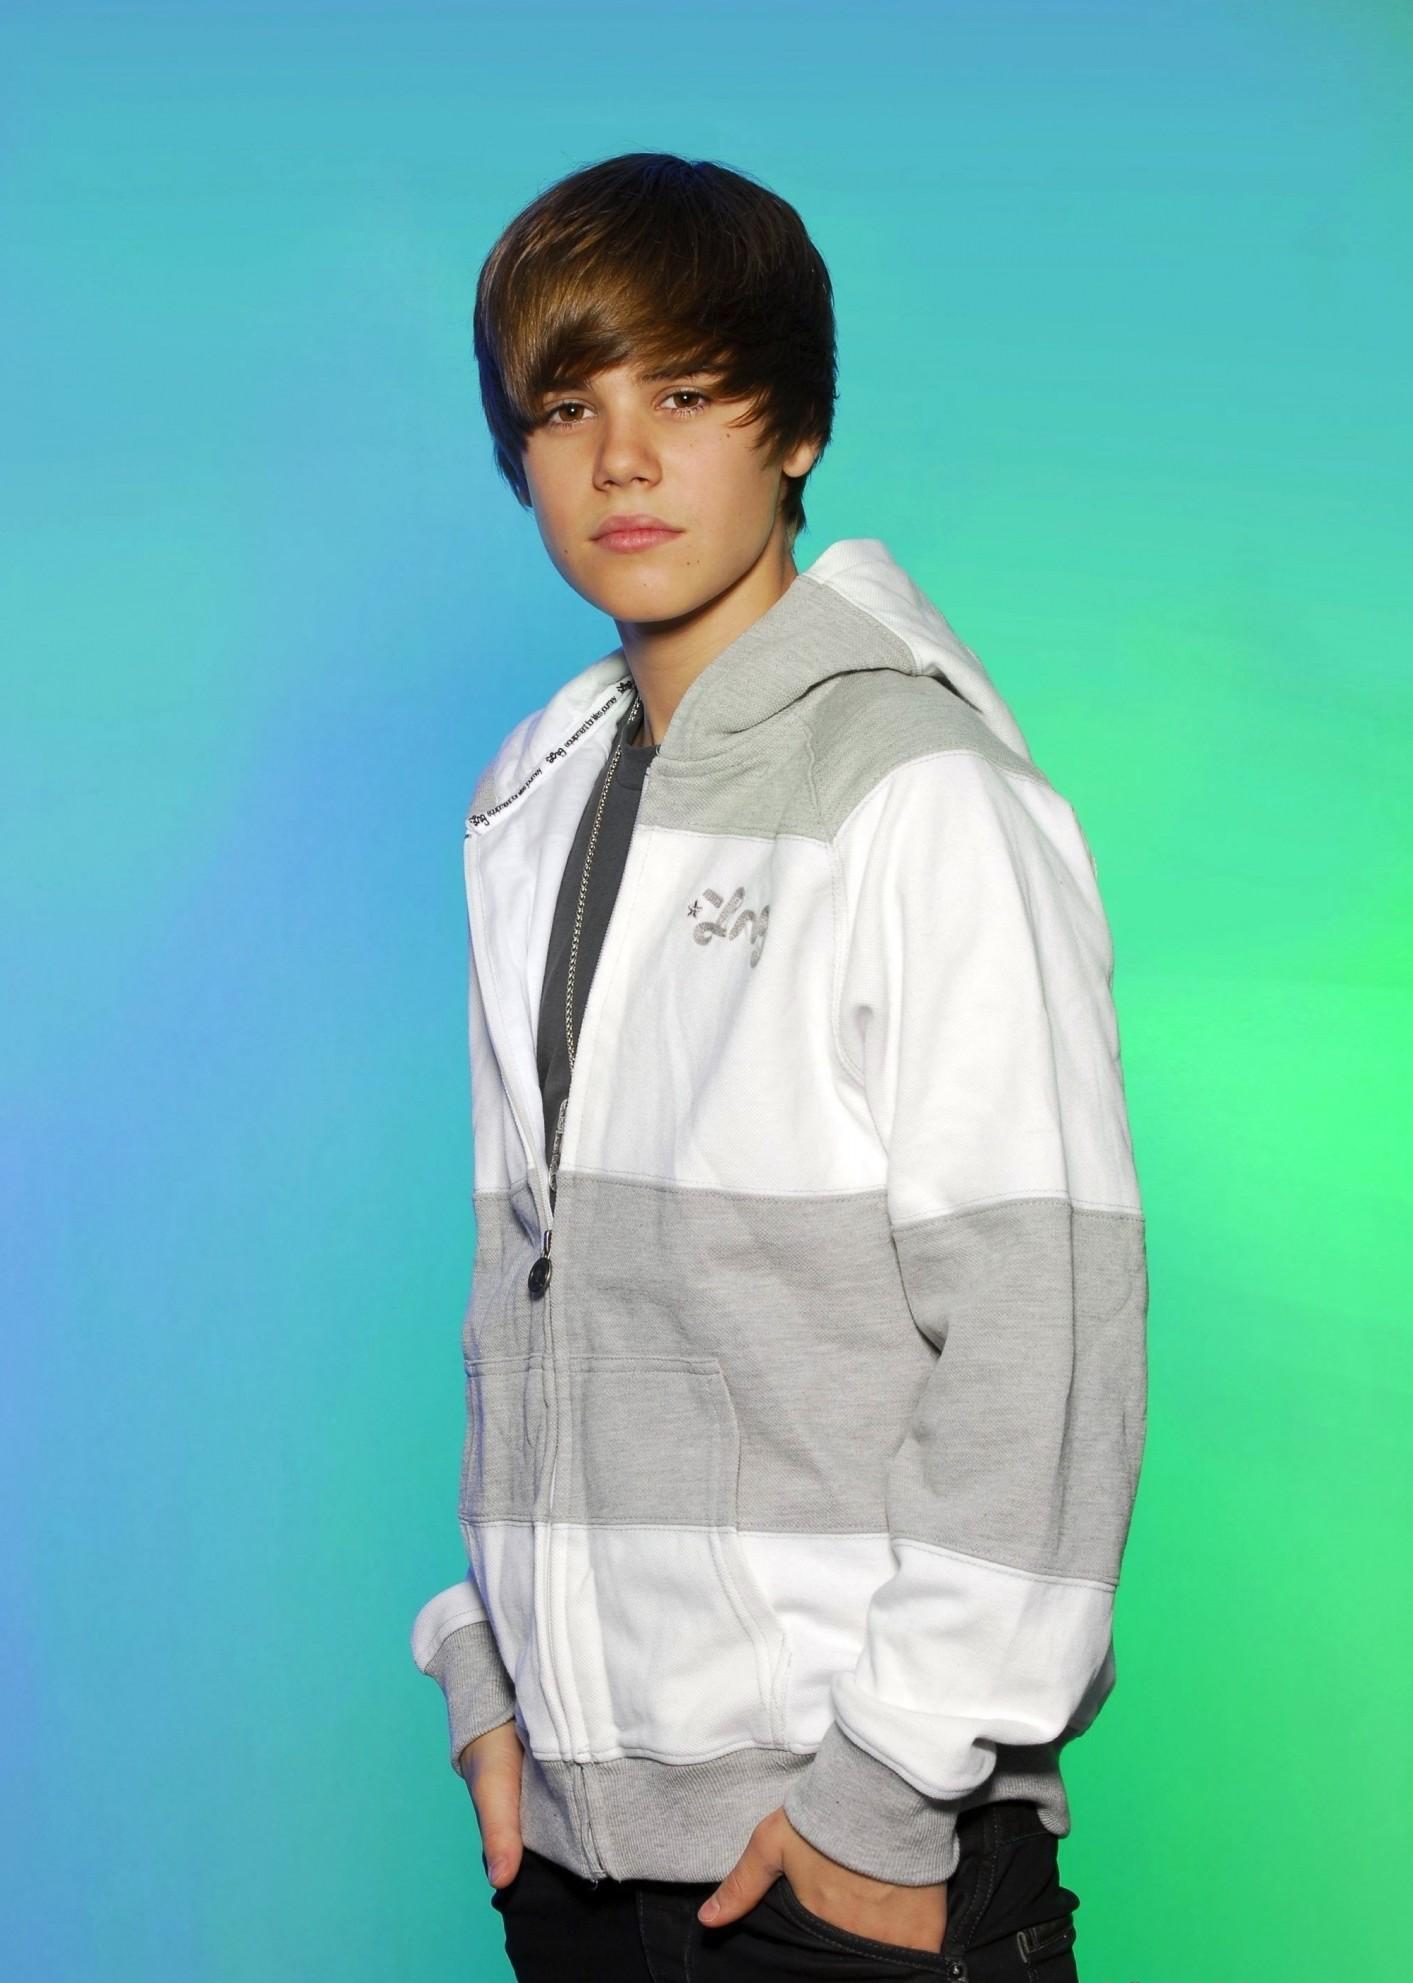 Bieber Photoshoot